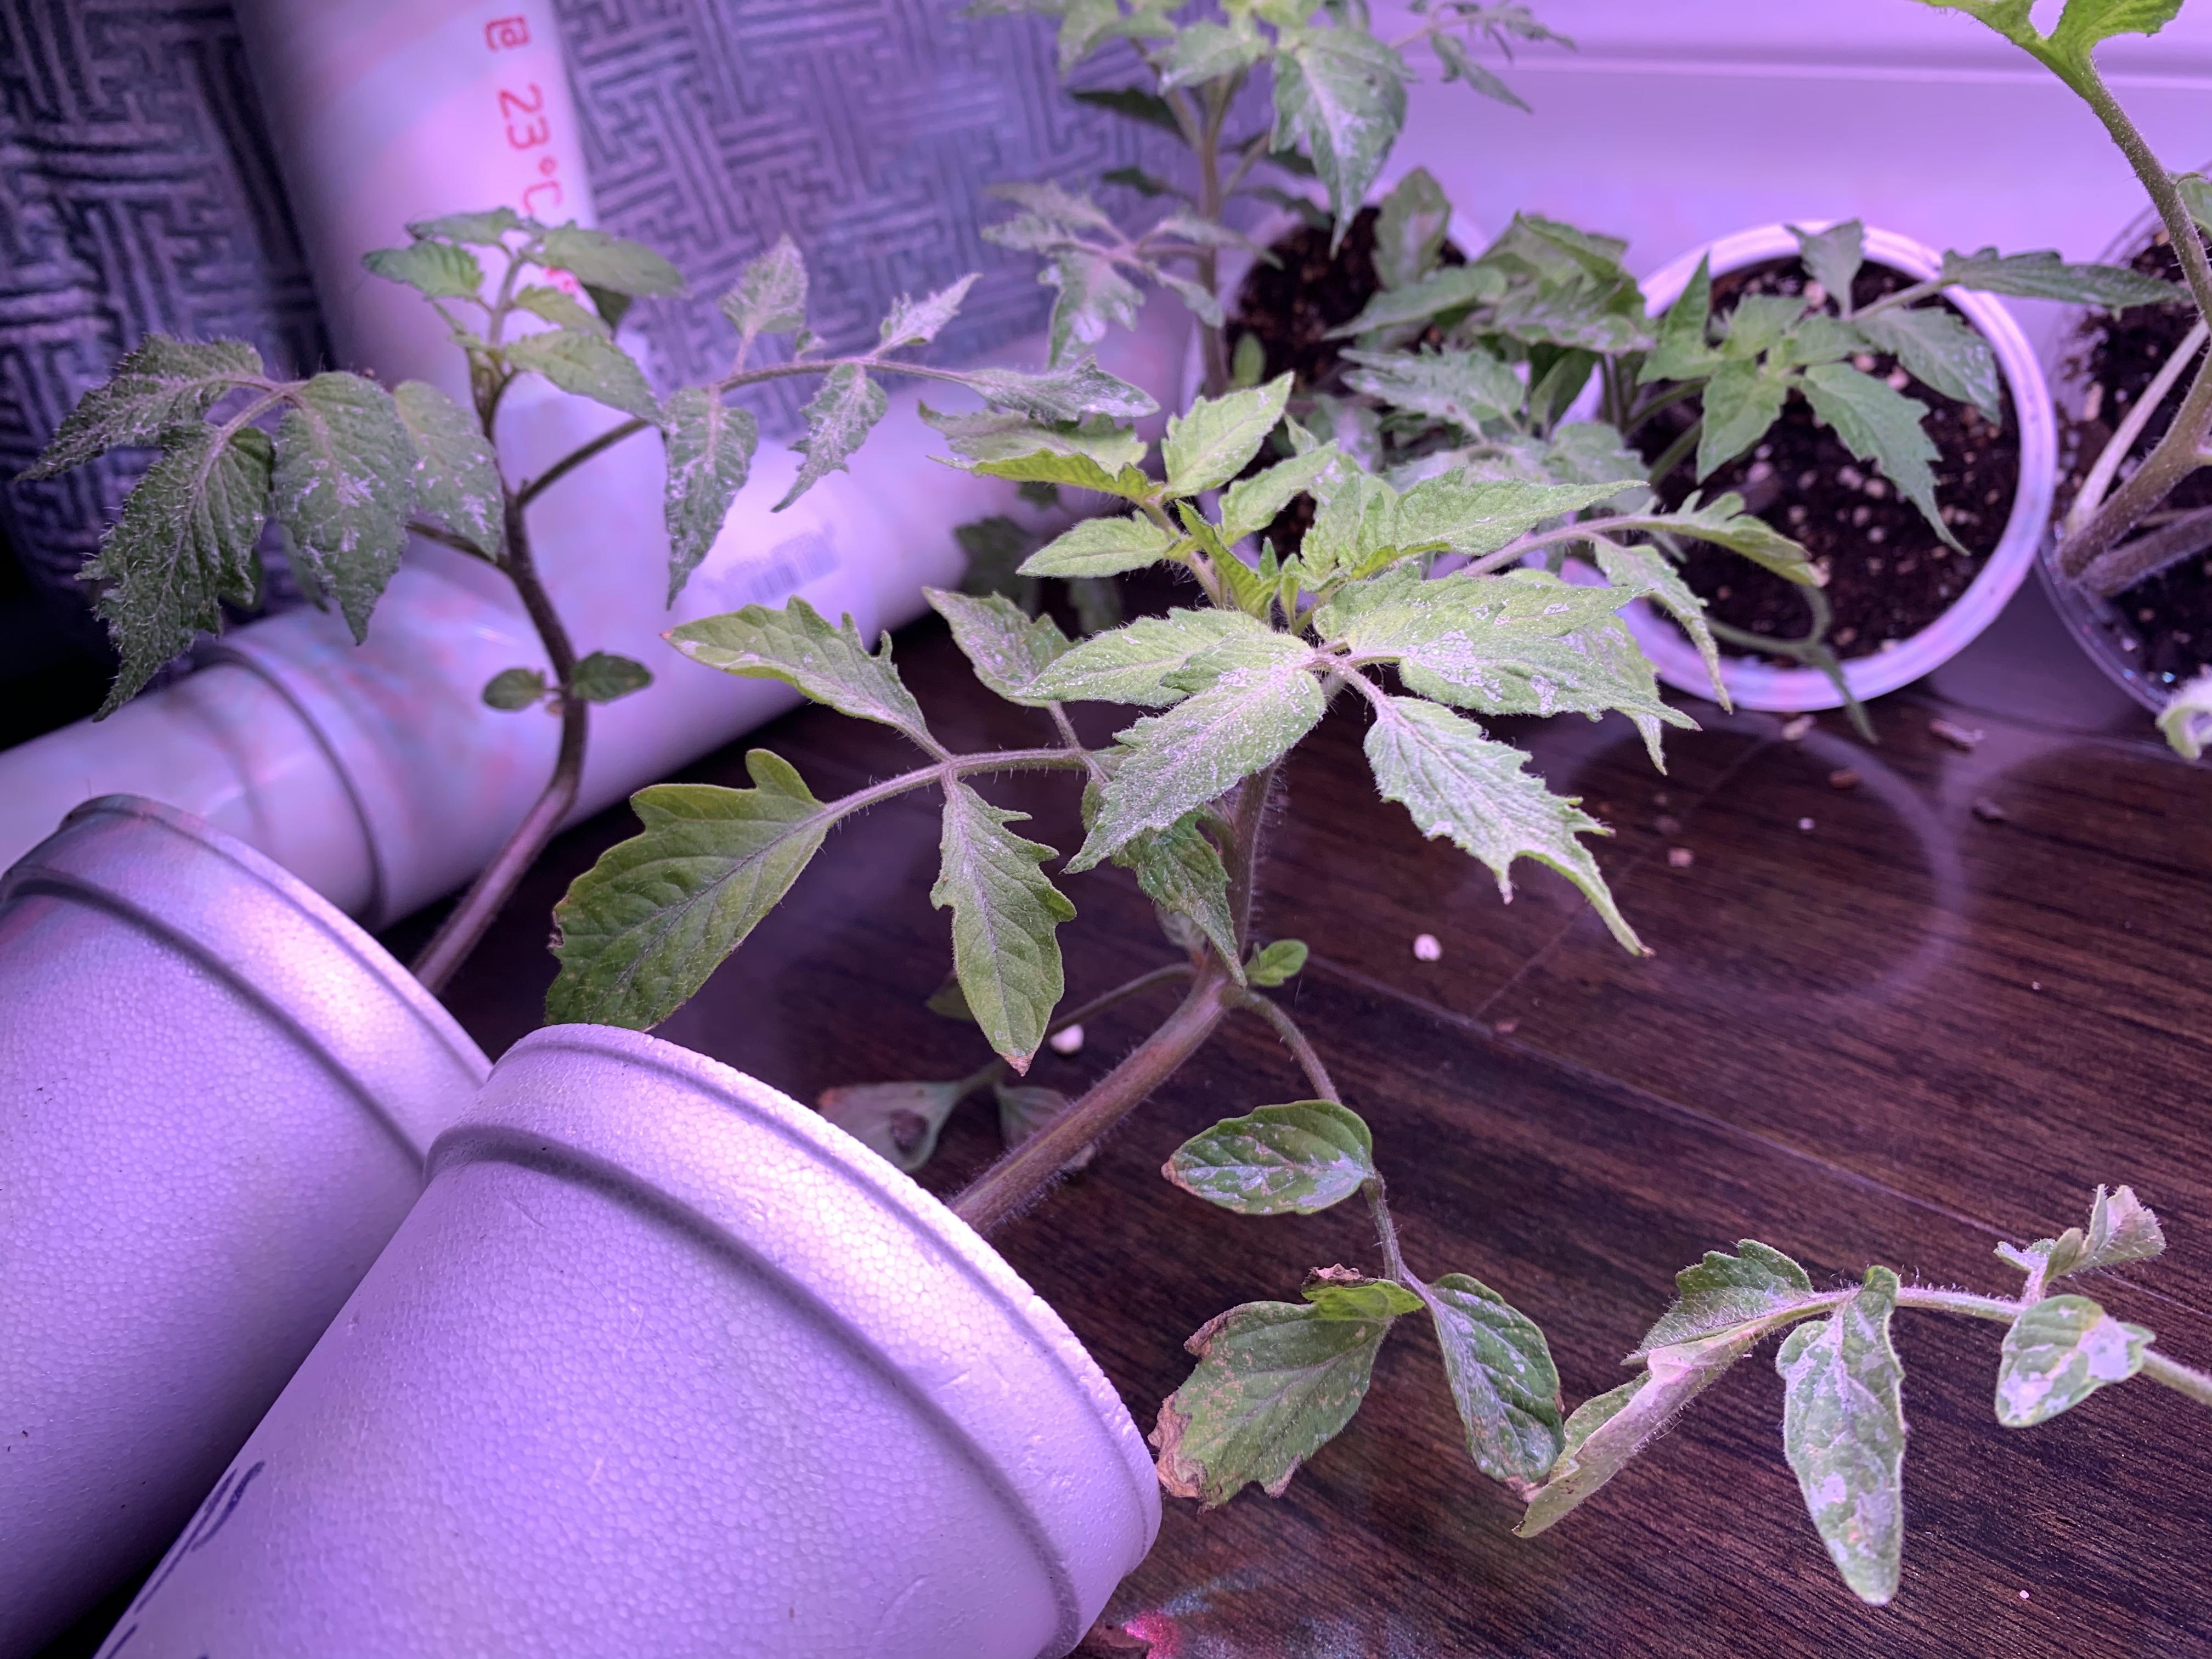 C6EE6022 3142 471A 9C94 3D1E42FD9BFB Self-control when gardening